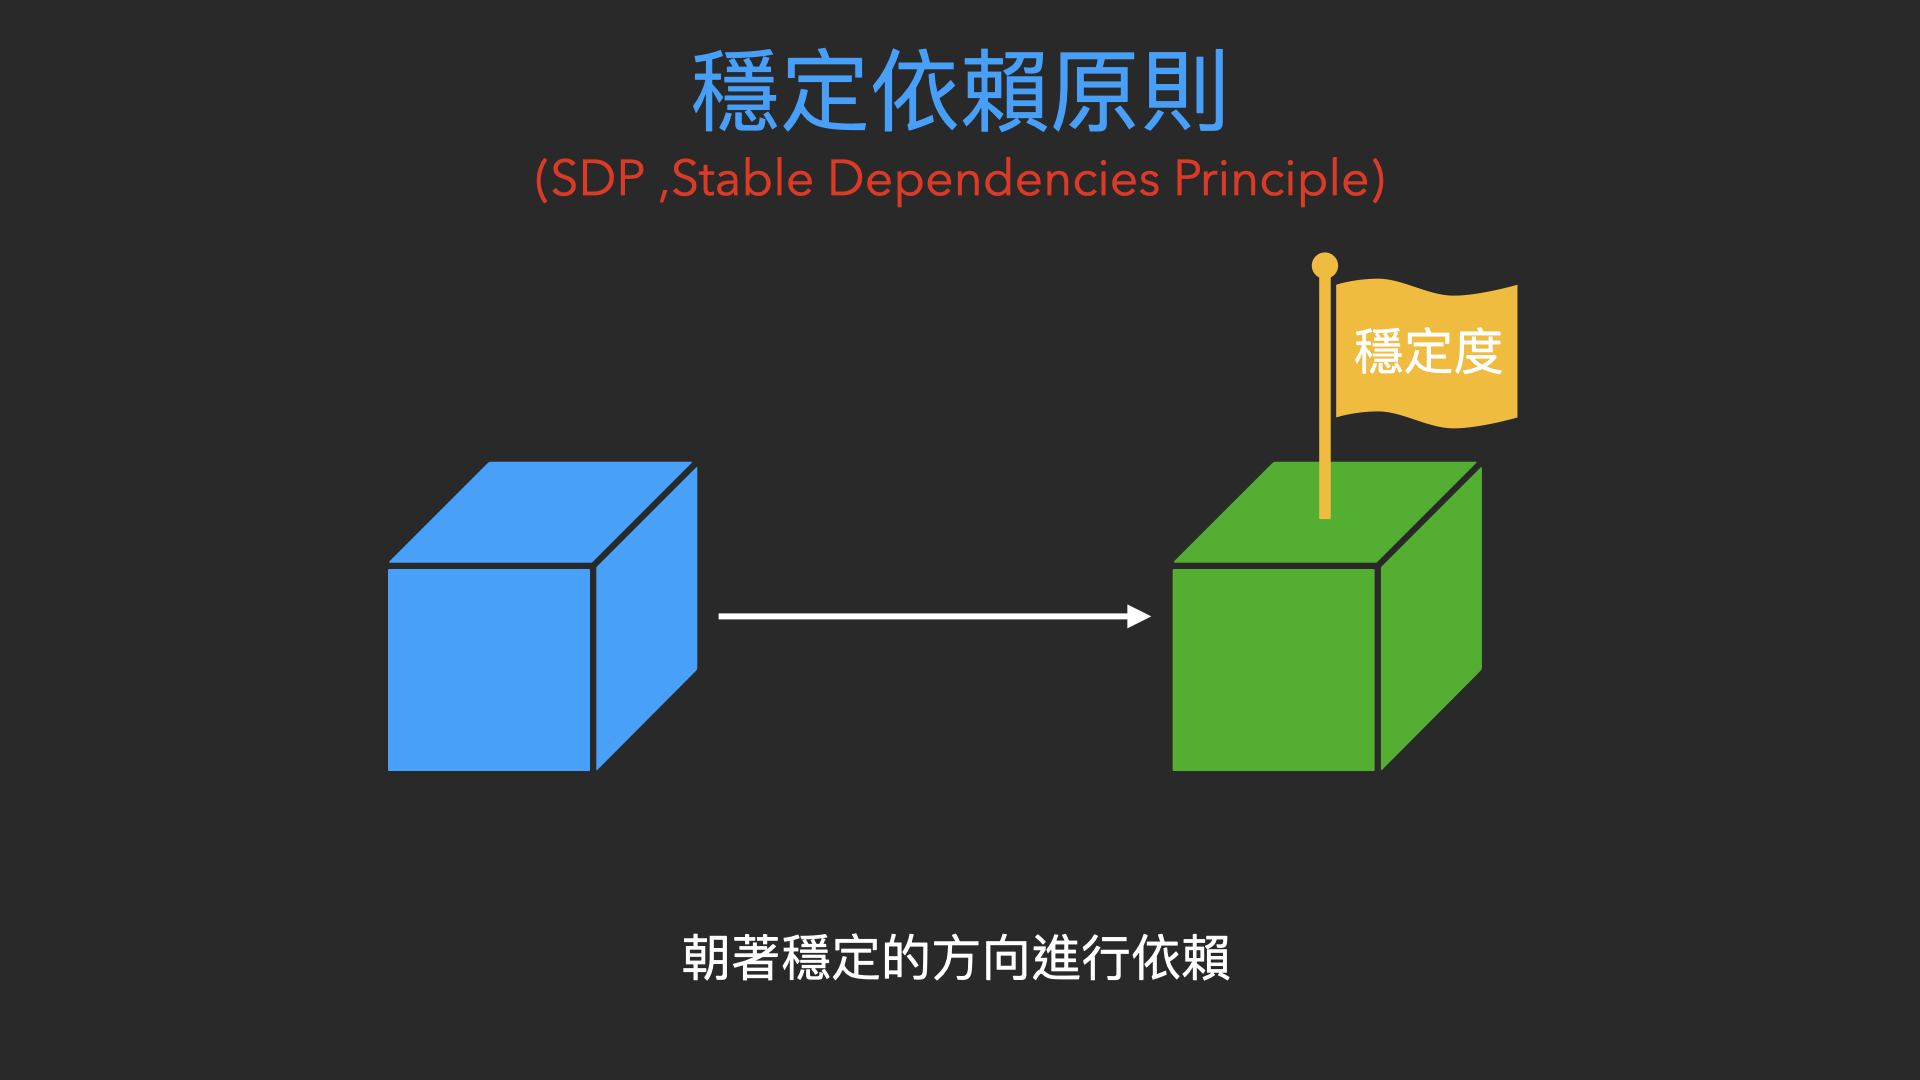 004-1.SDP